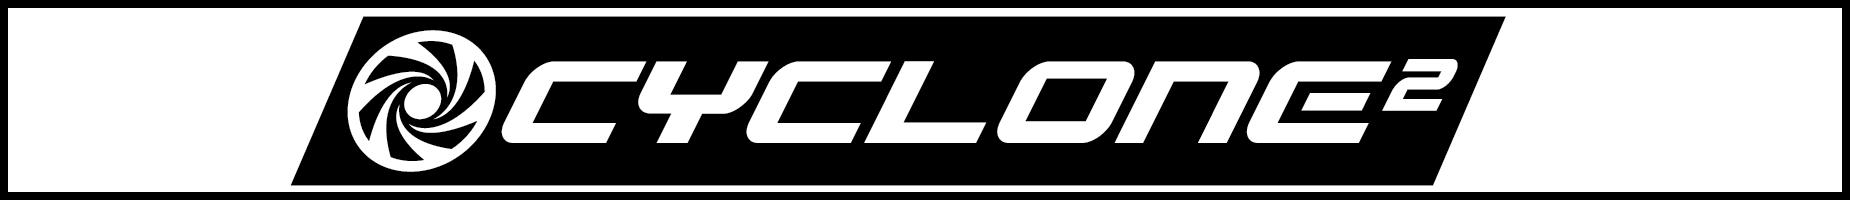 Headers_cyclone-01